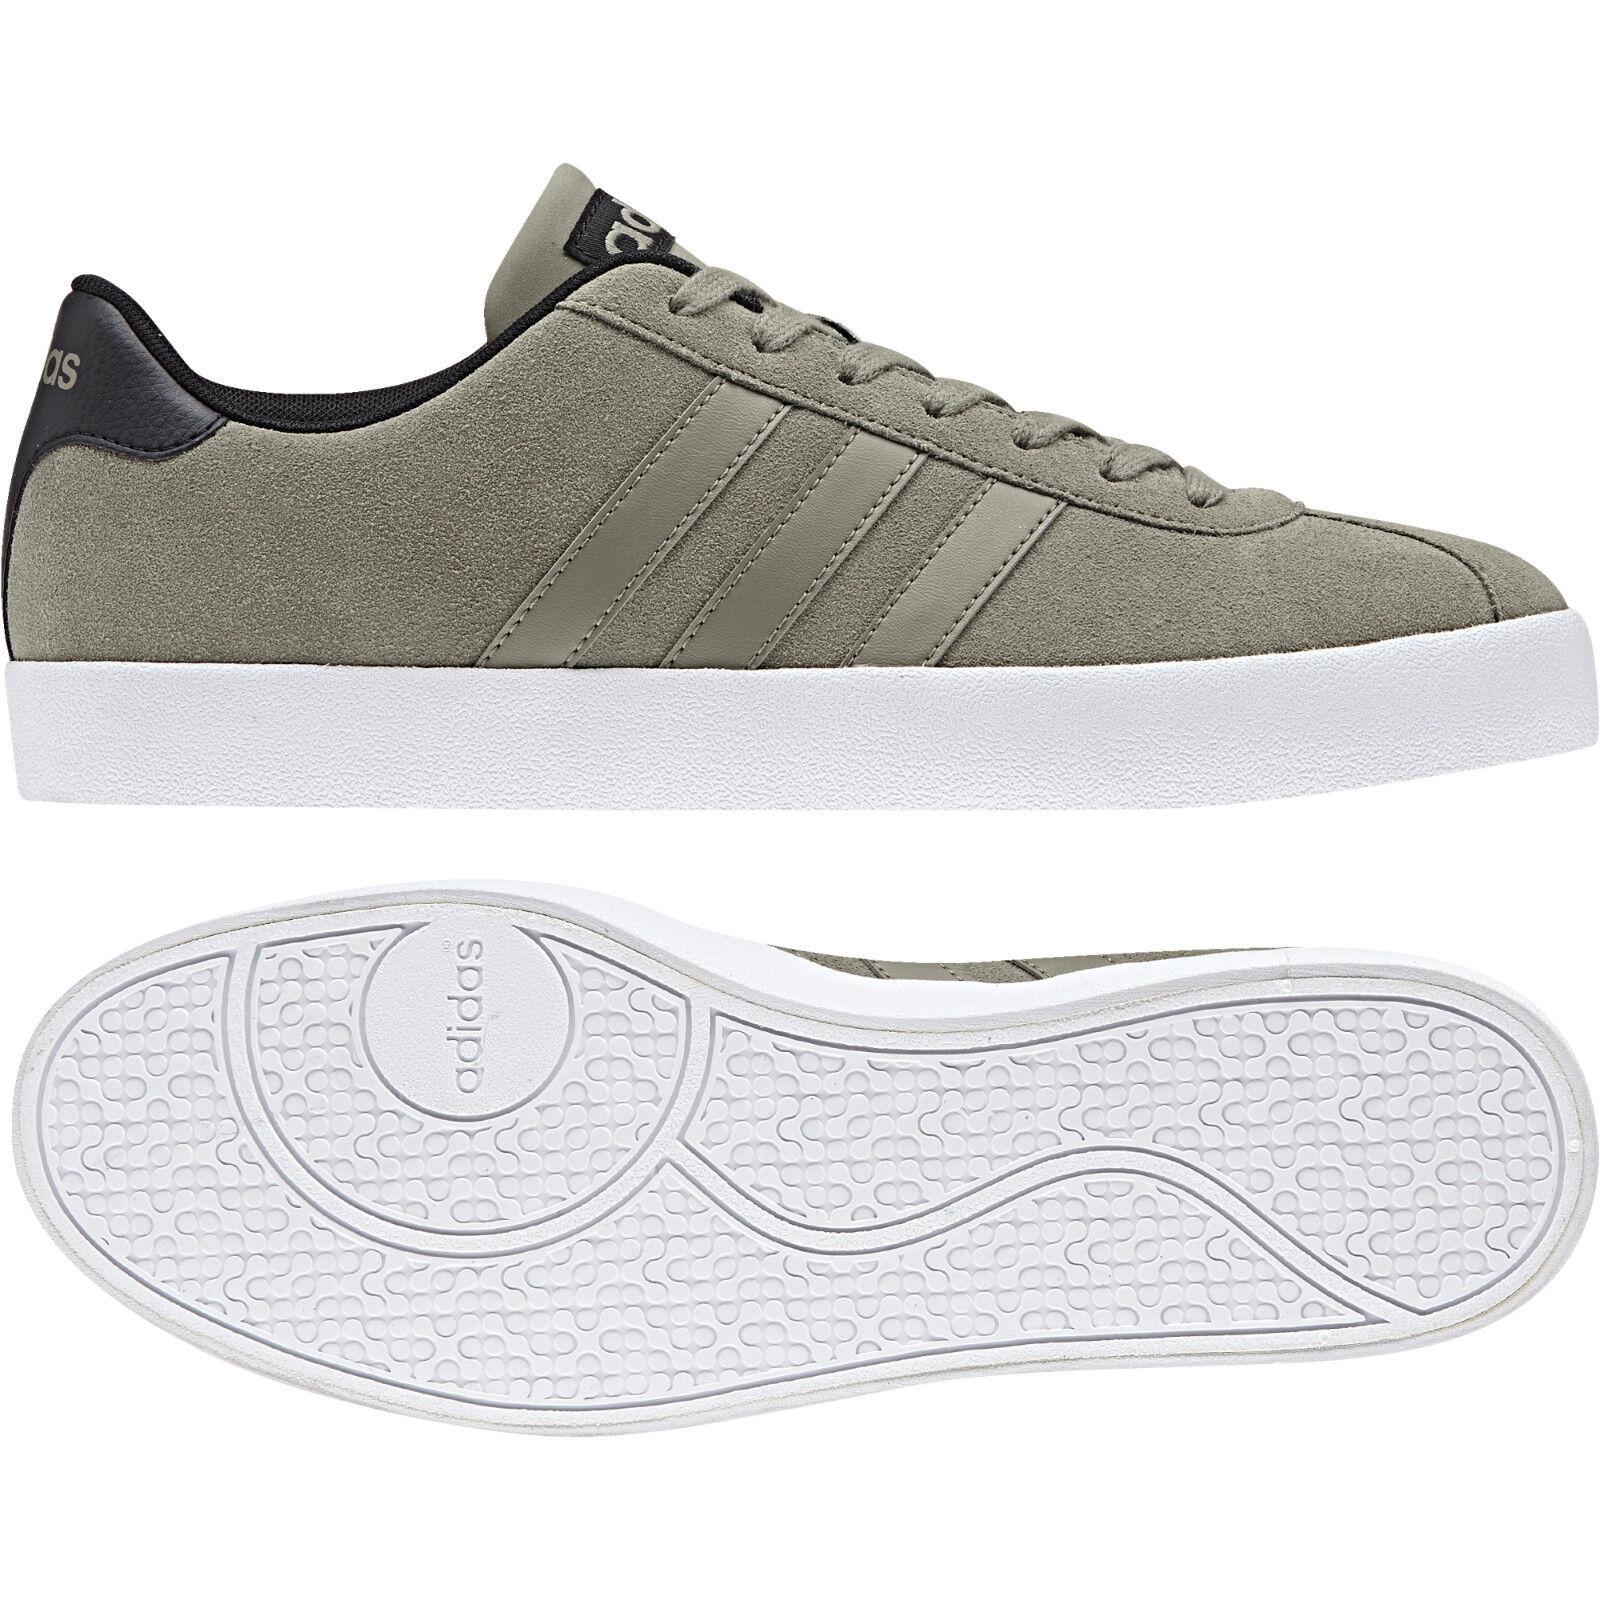 Vulc Chaussures Sneaker Neo Court Adidas Bb9639 De Prix Sport Beige B5vqq7Ow